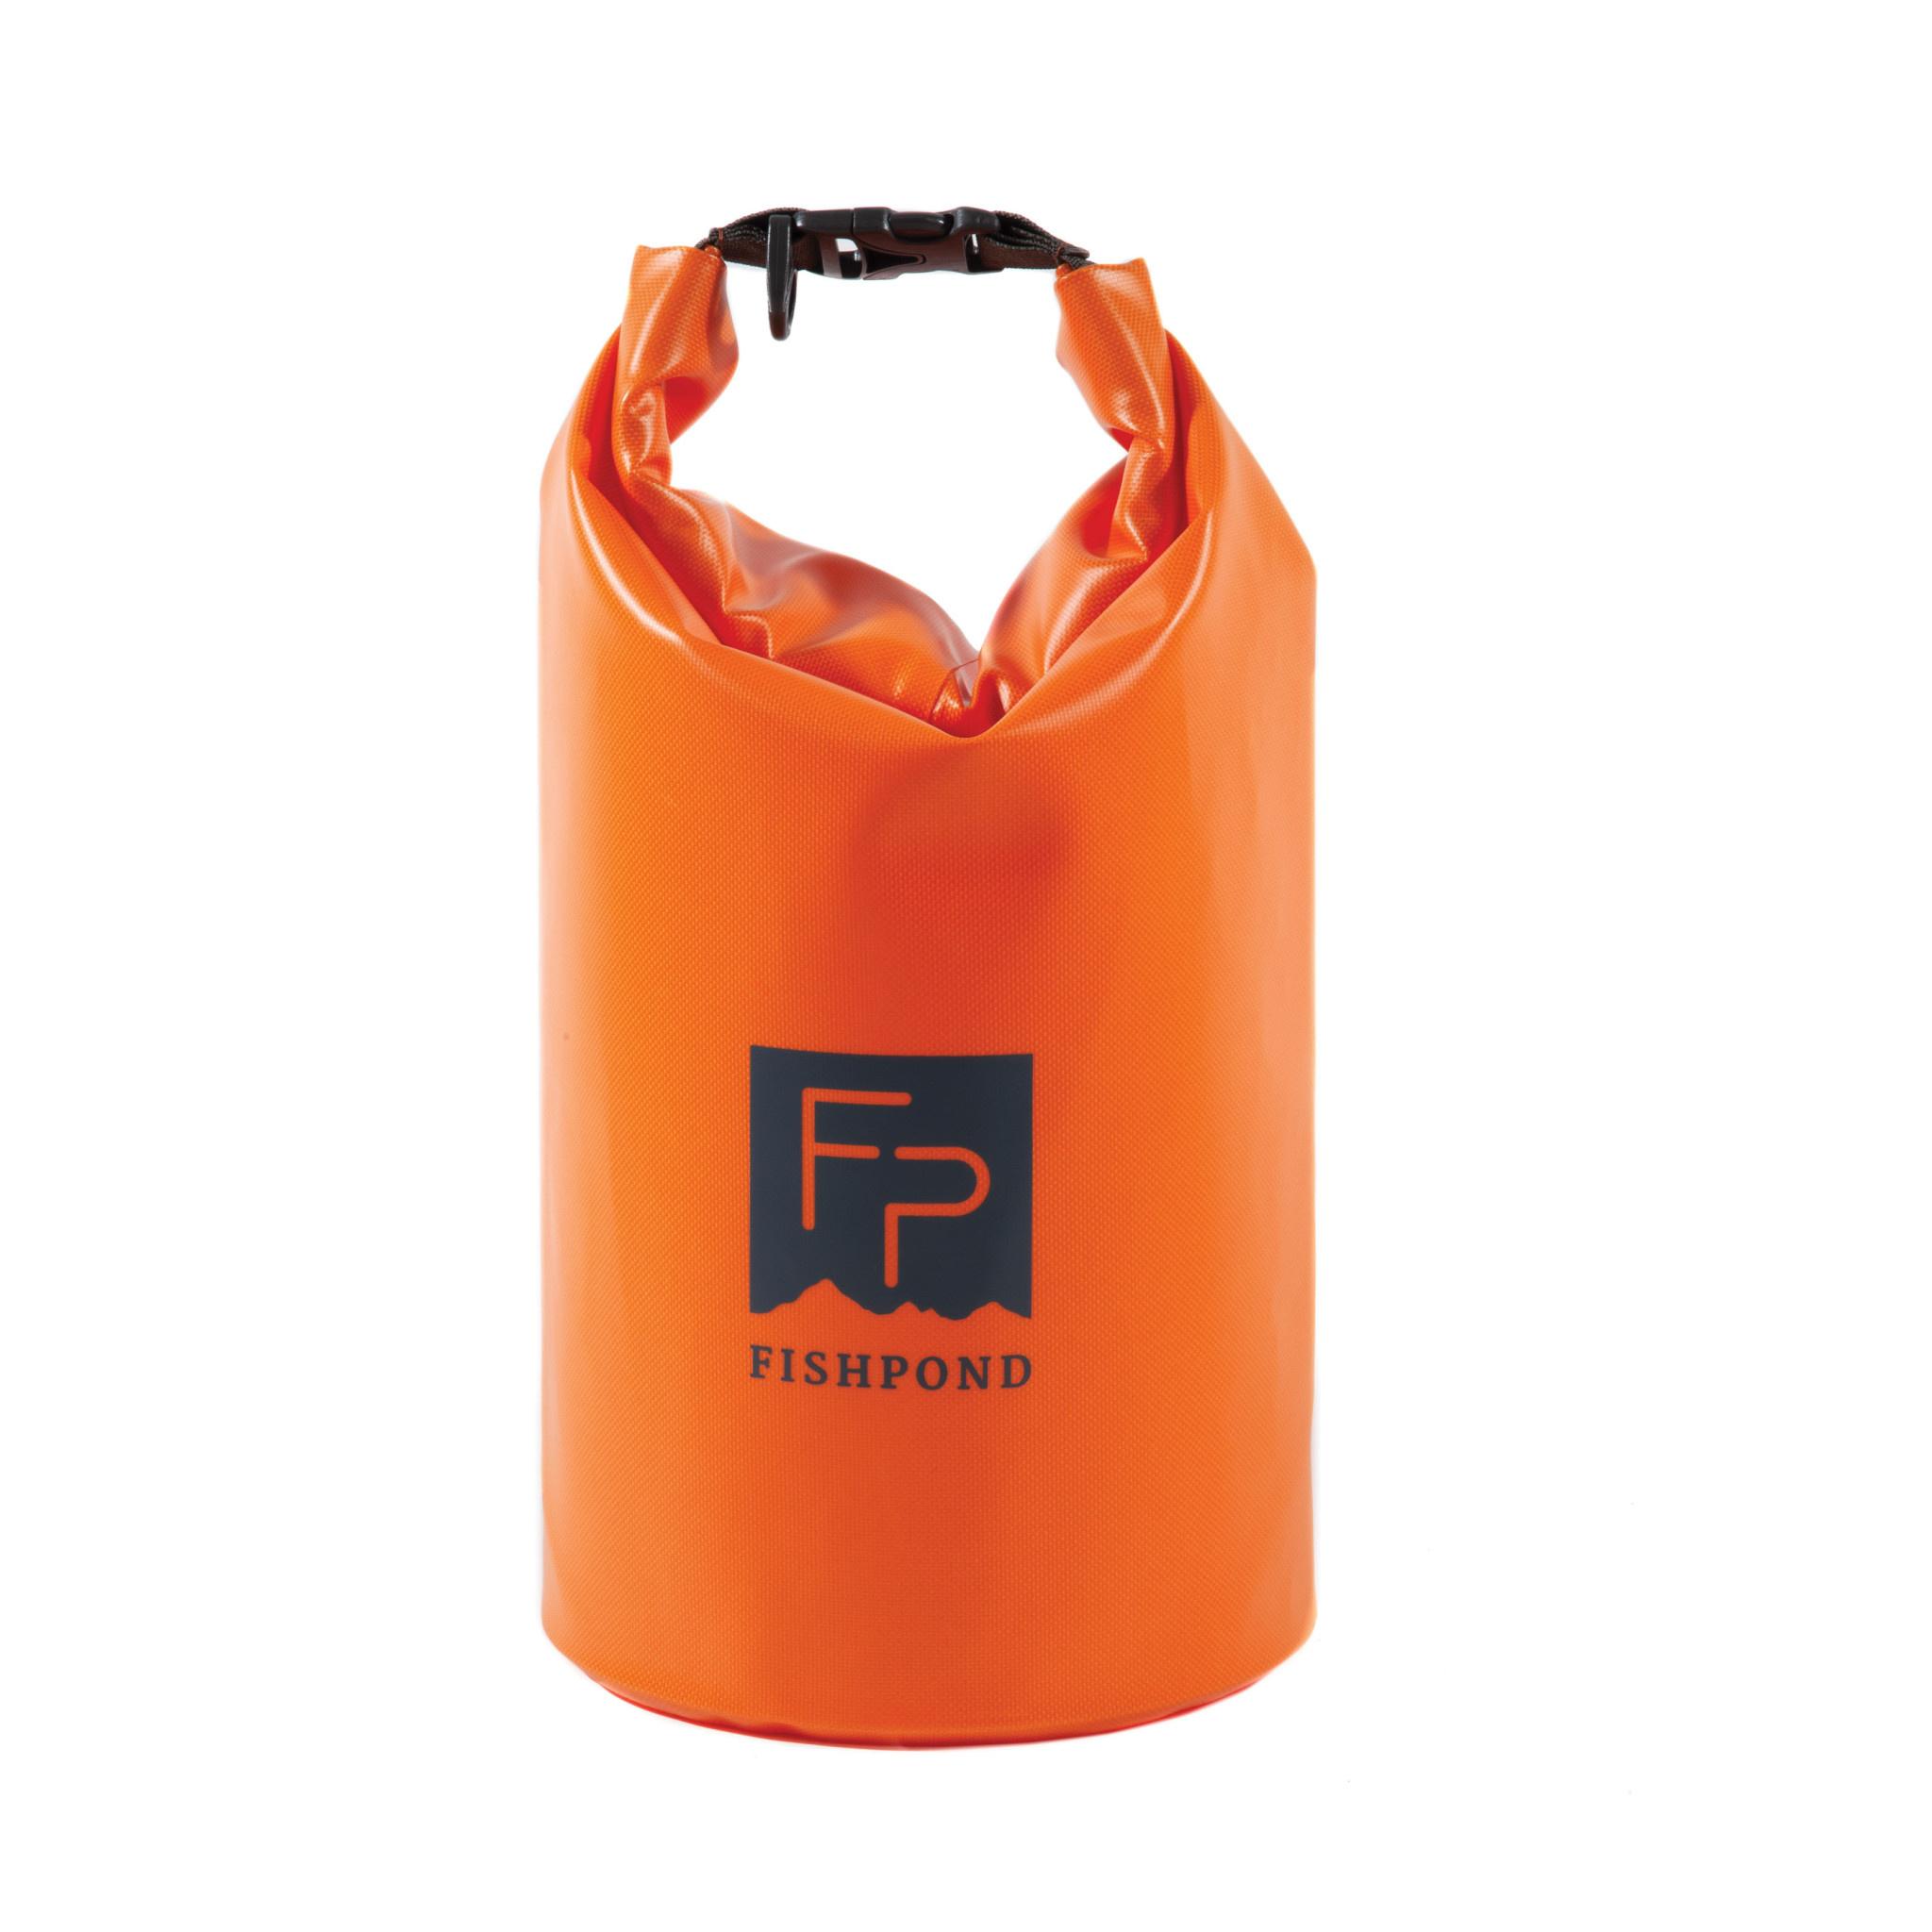 Fishpond Fishpond Thunderhead Roll-Top Dry Bag